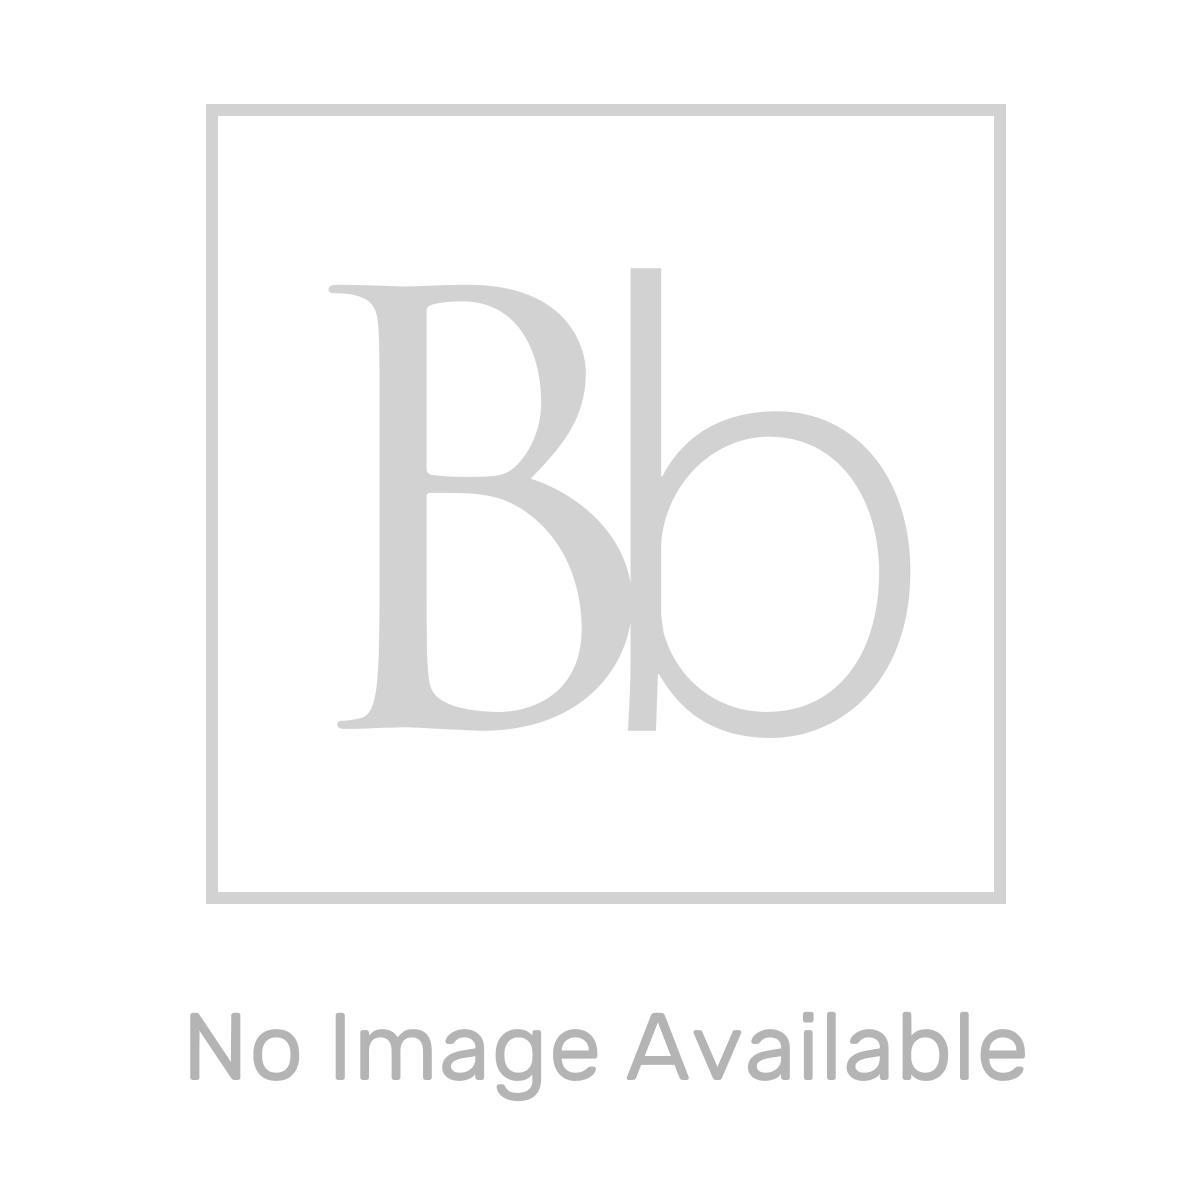 Lakes White Low Profile Quadrant ABS Tray 1000mm